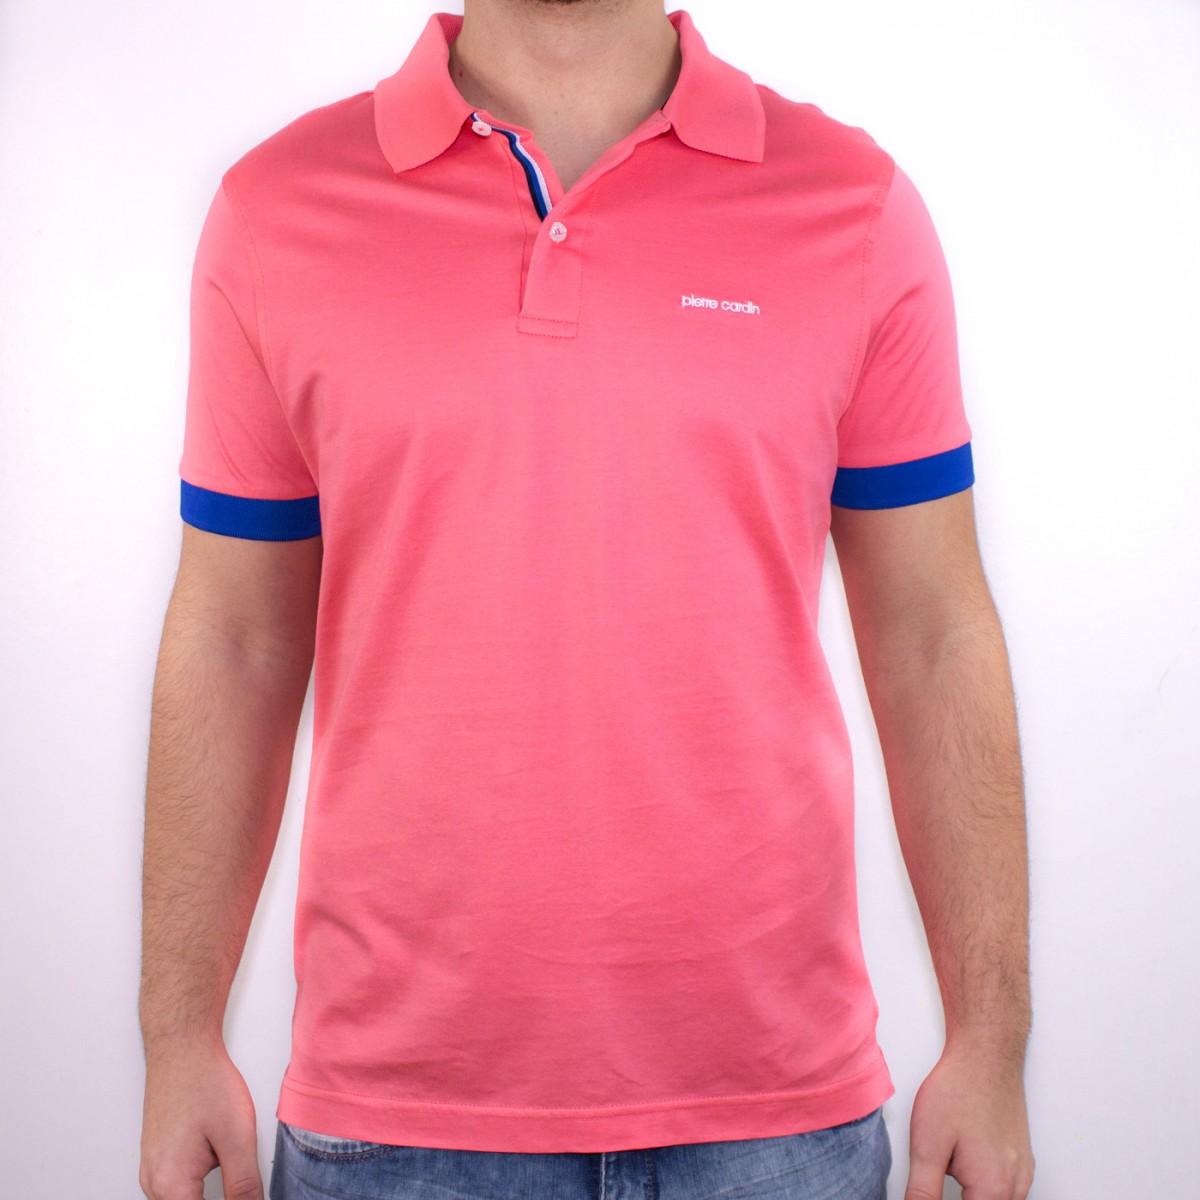 e33a3ce98b Bizz Store - Camisa Polo Masculina Pierre Cardin Marinho Salmão